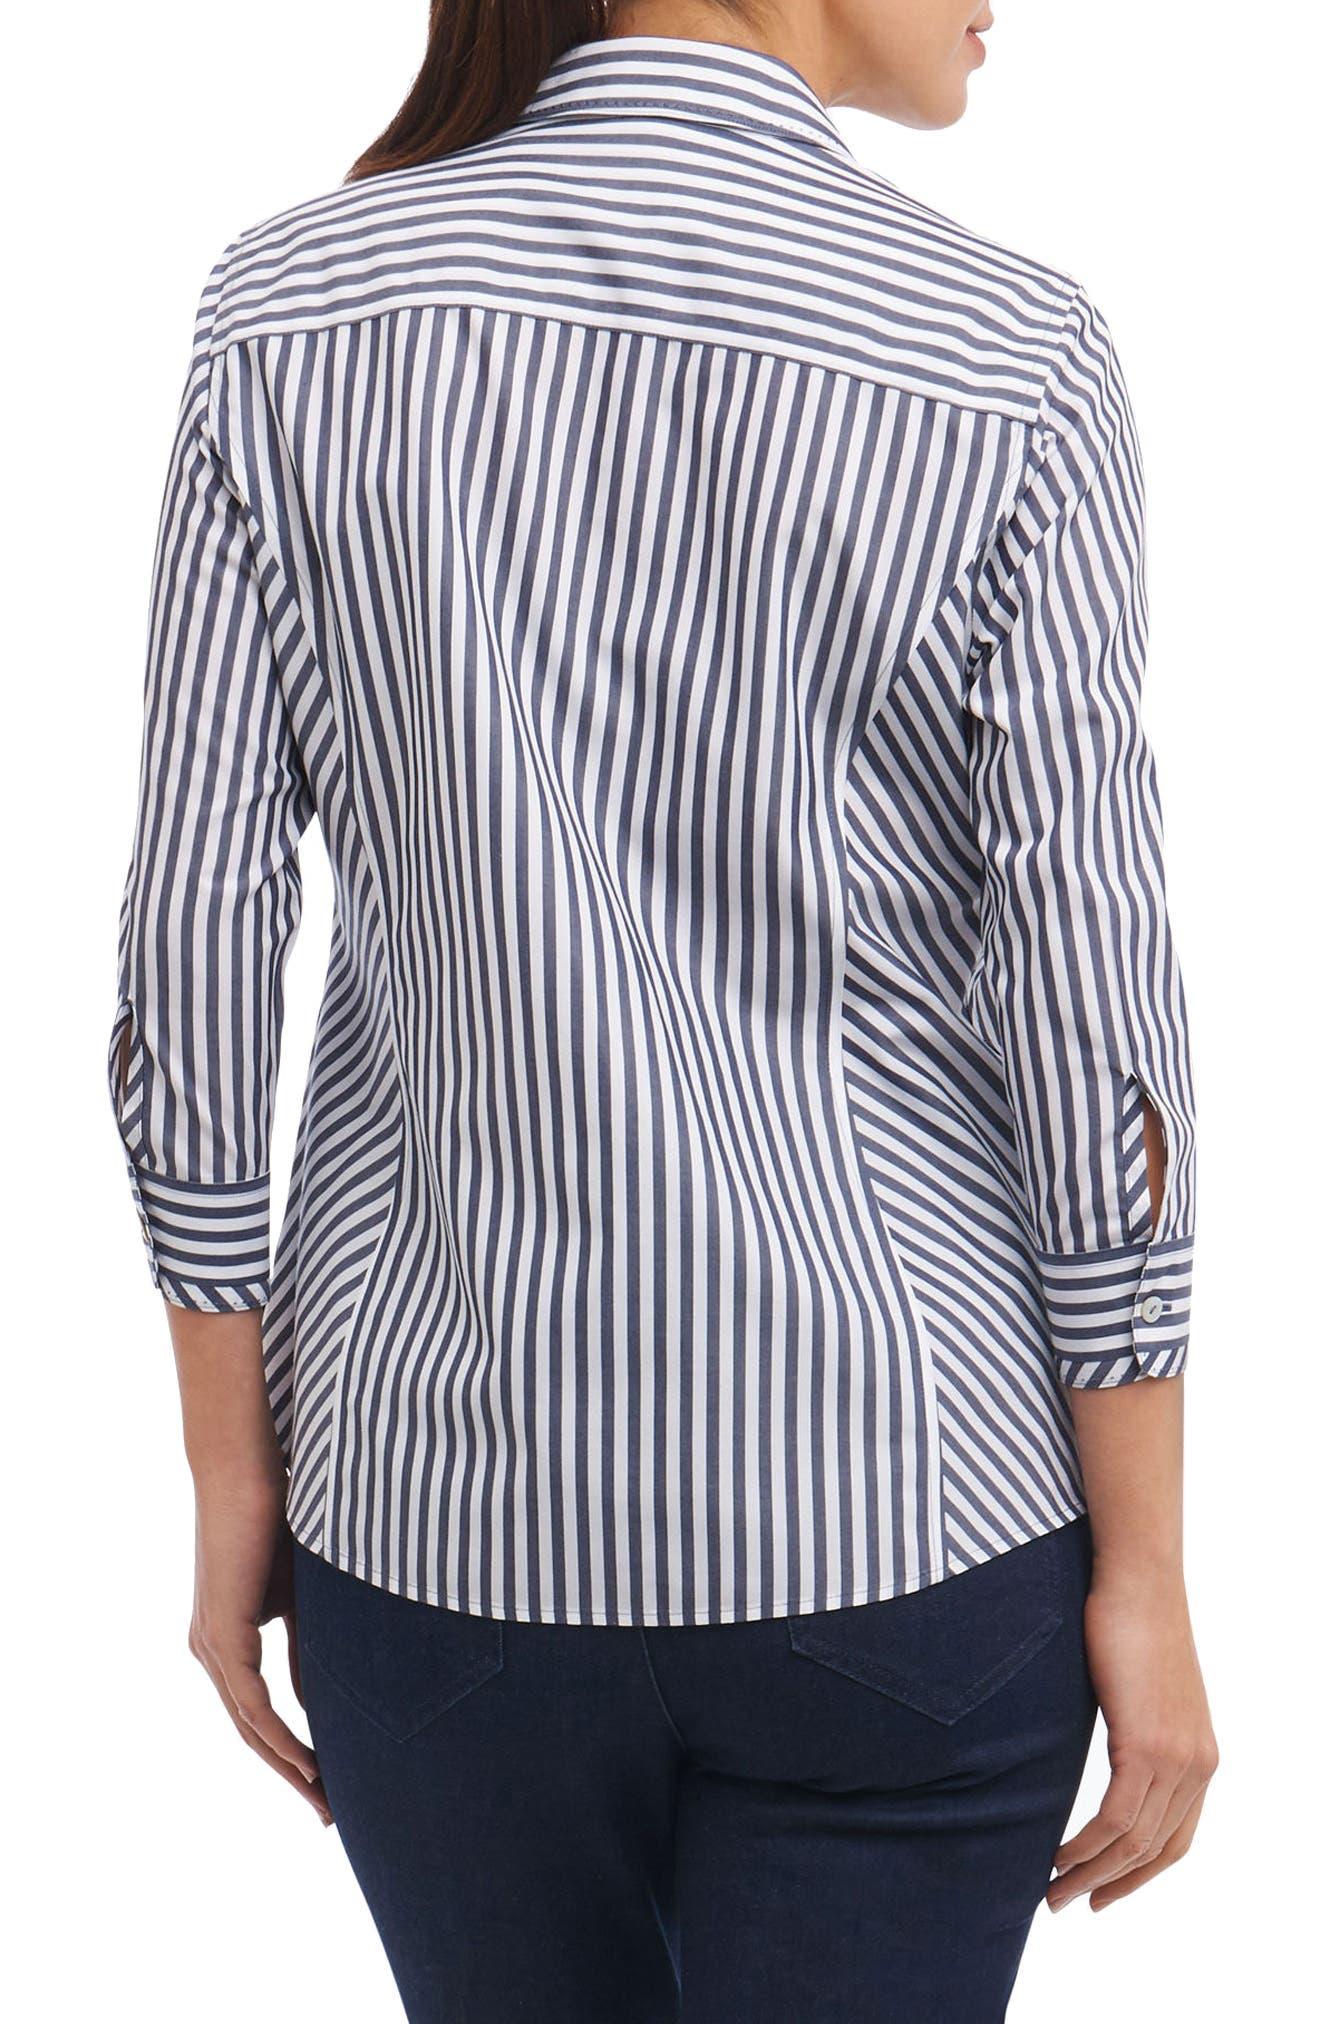 Hope Preppy Stripe Cotton Shirt,                             Alternate thumbnail 3, color,                             Navy